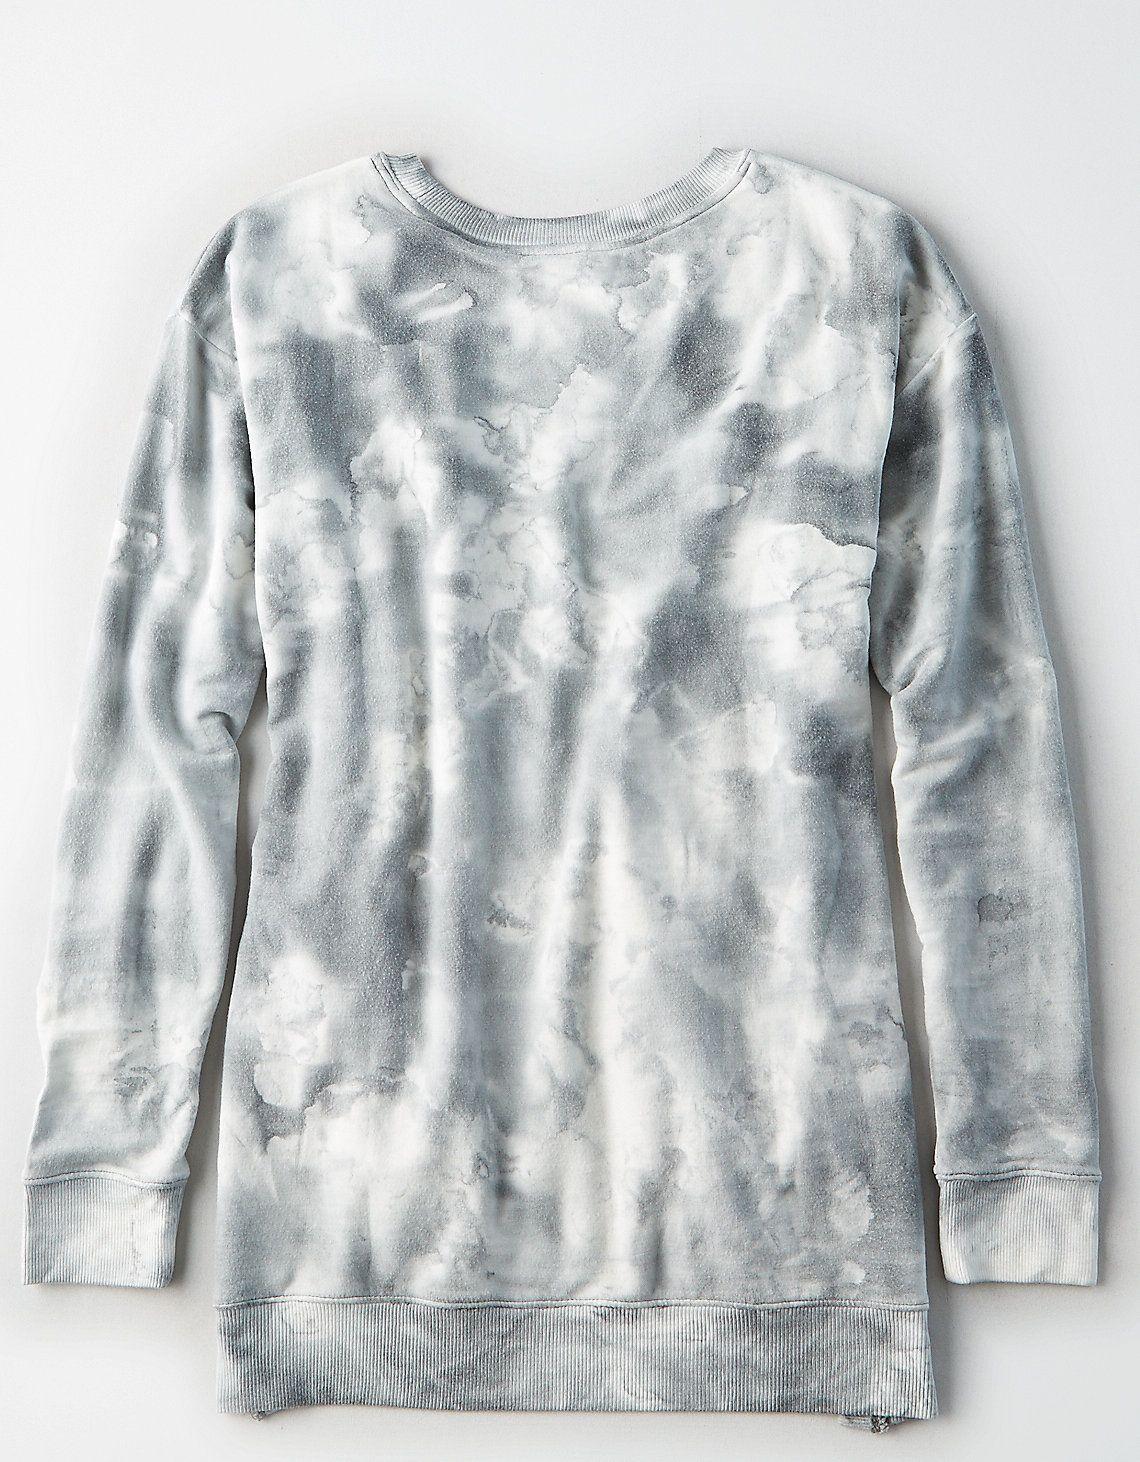 Aeo soft u sexy split side sweatshirt aeo soft fabrics and sweatshirt